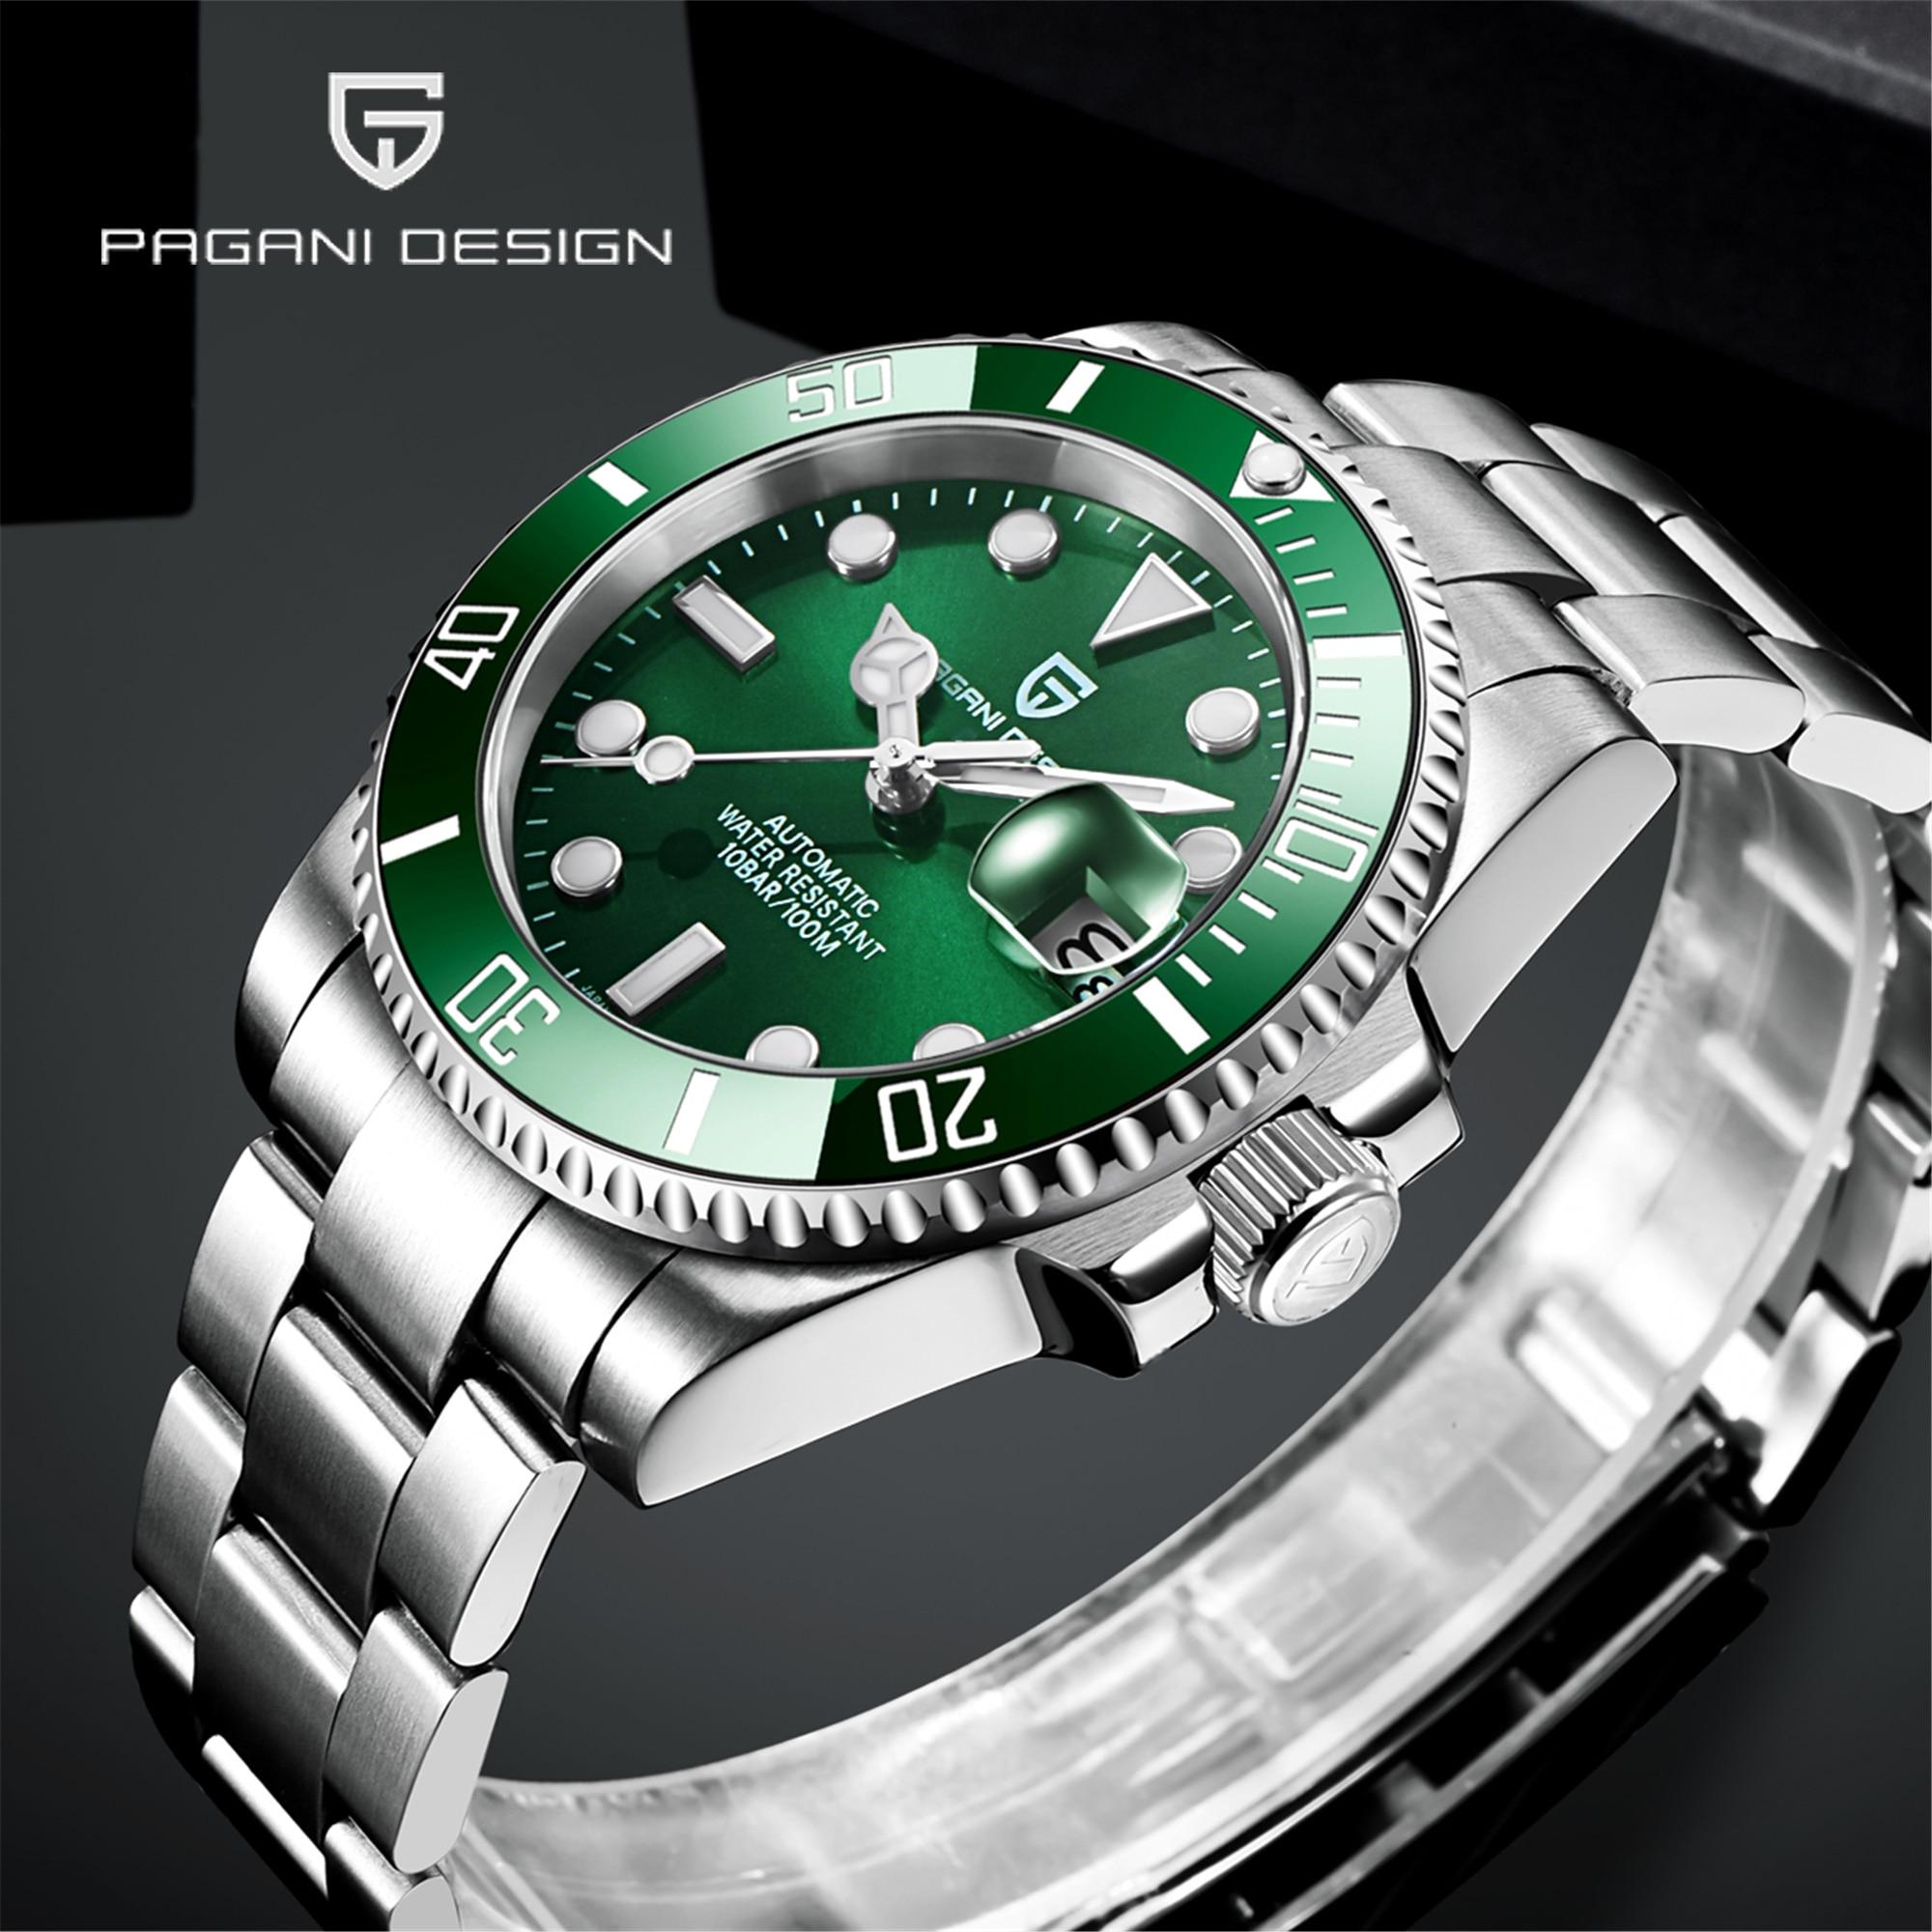 2021 Pagani تصميم أفضل الرجال الفاخرة التلقائي ساعة ميكانيكية 40 مللي متر الياقوت الزجاج NH35 تتحرك ساعة مضادة للماء Relogio Masculino